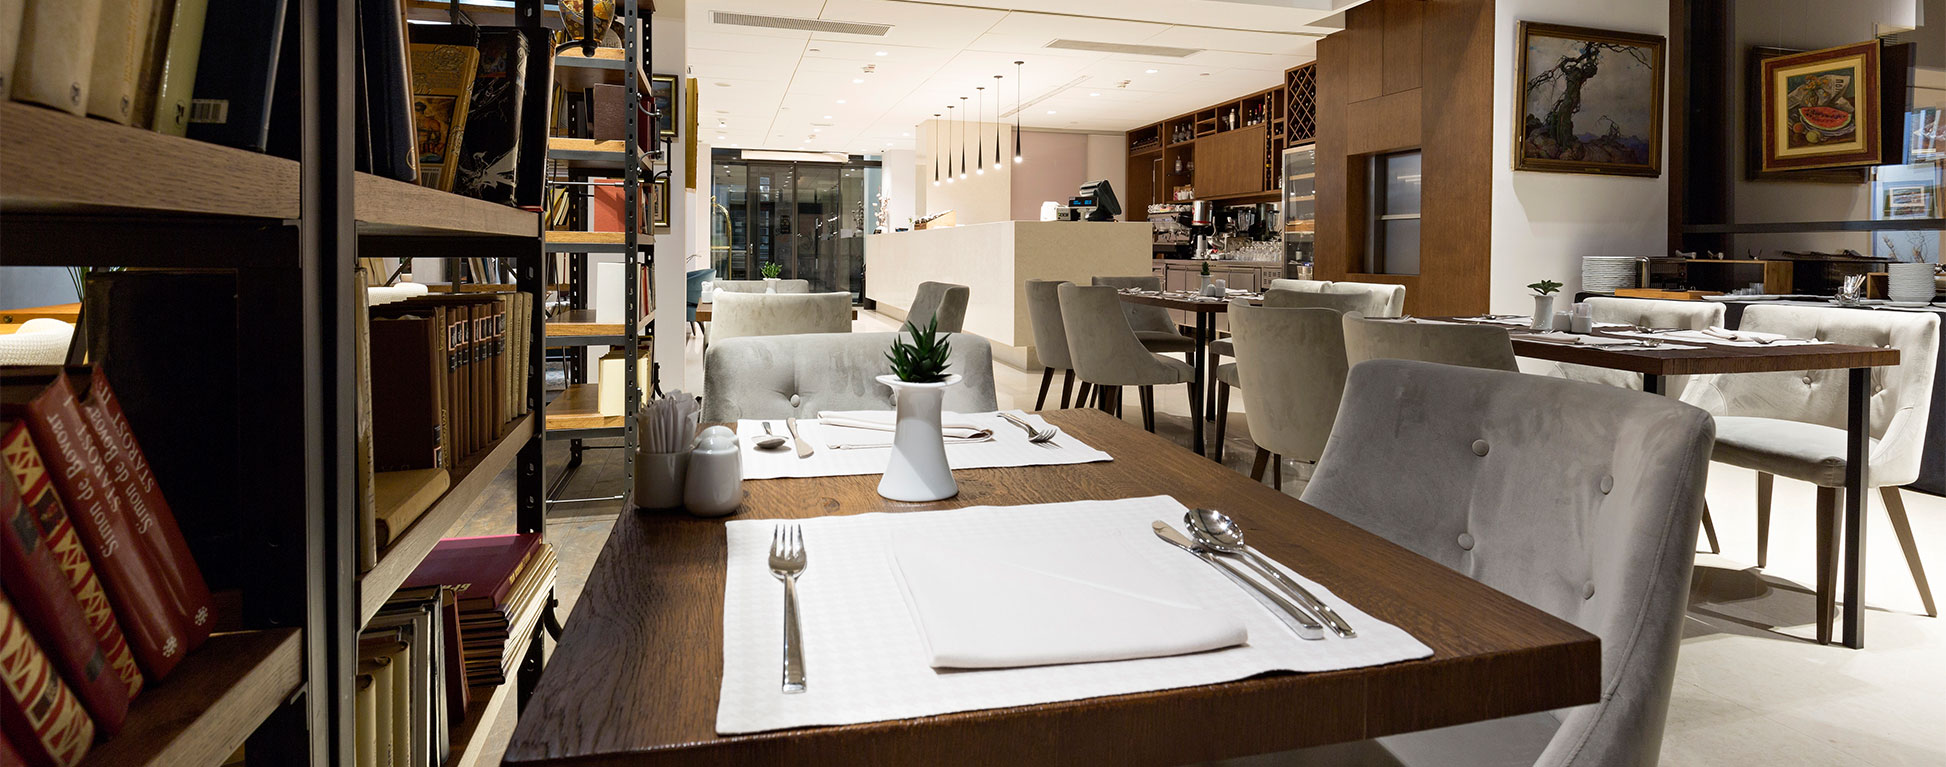 restaurant-header-1